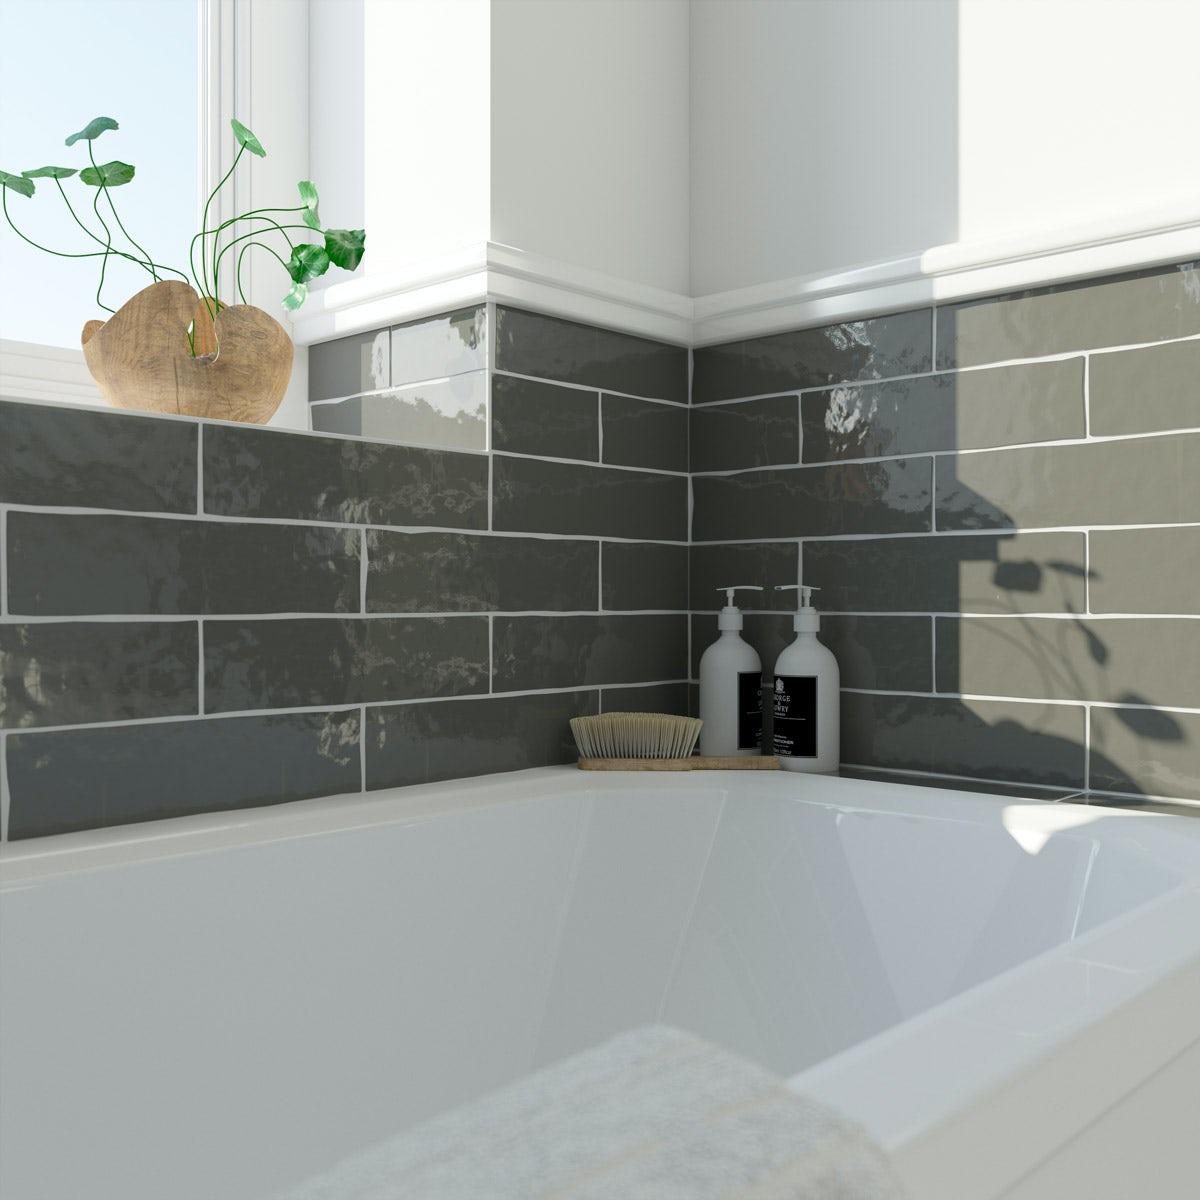 Laura Ashley Artisan charcoal grey wall tile 75mm x 300mm